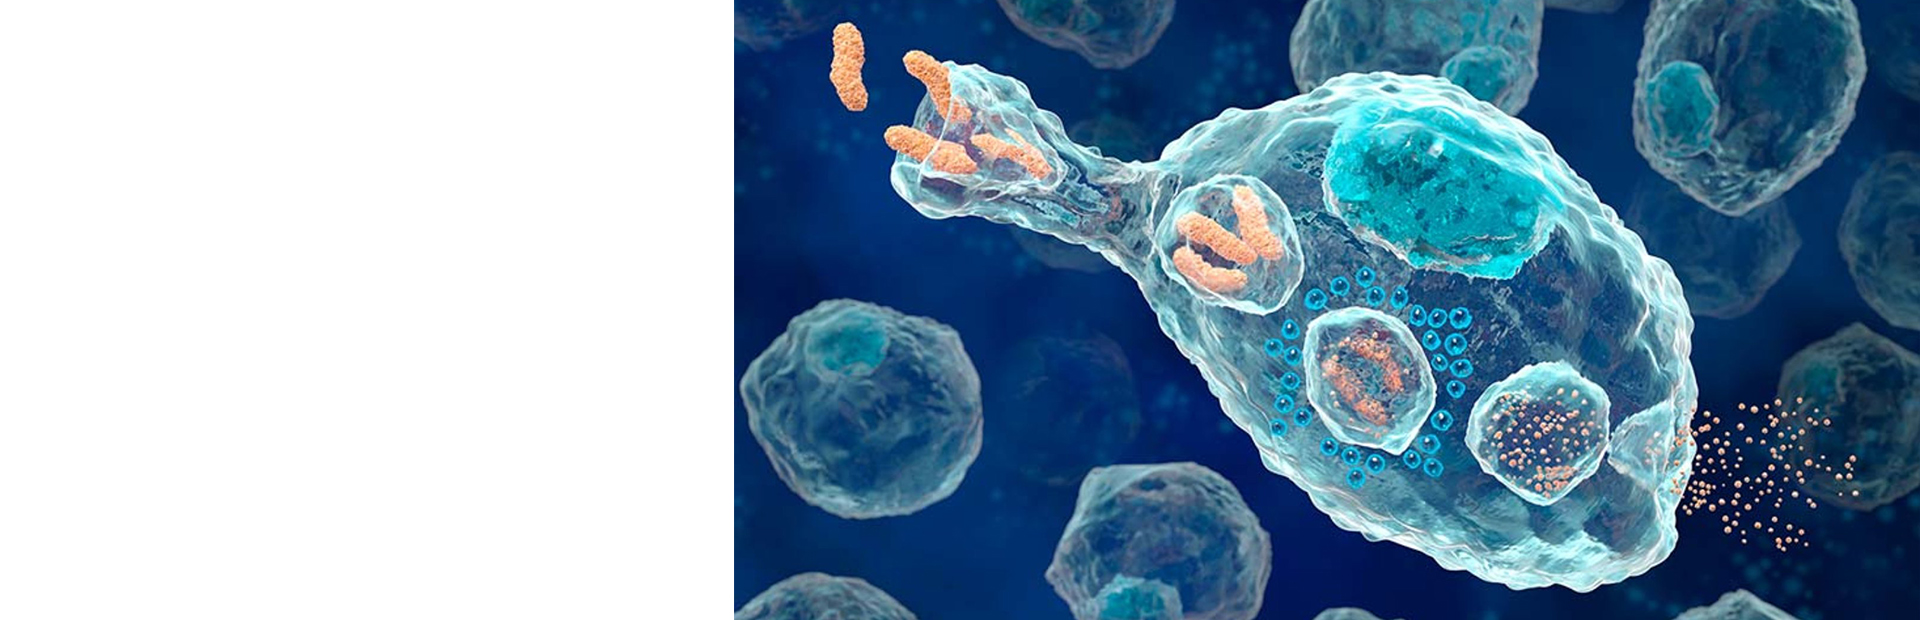 Оценка фагоцитоза